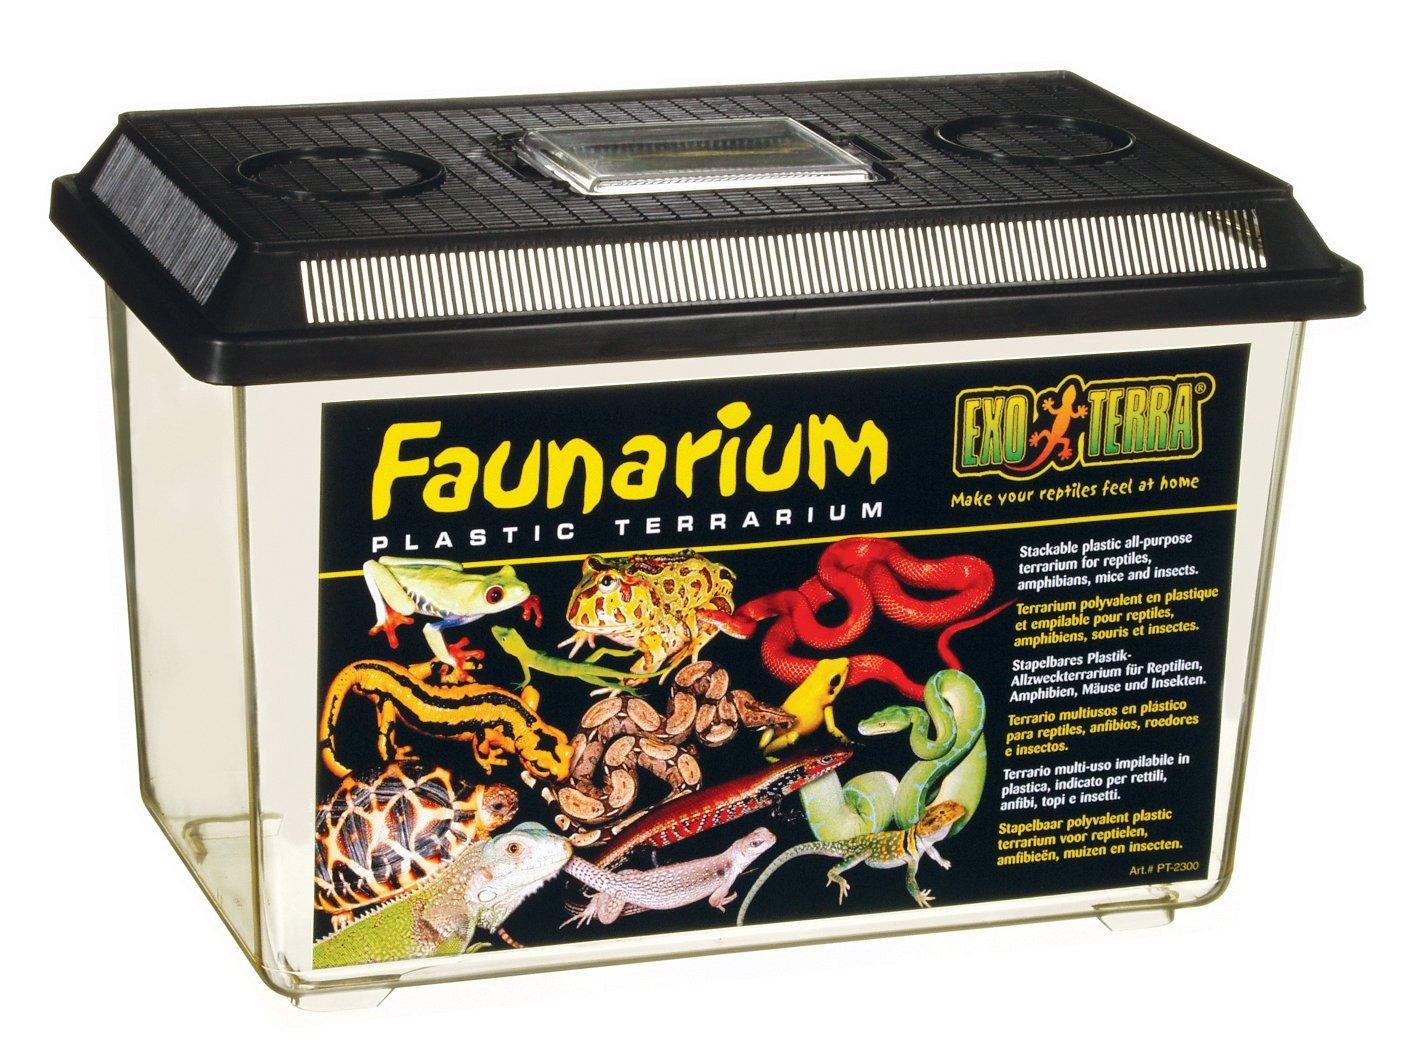 Exo Terra PT2265 Standard Faunarium, Large